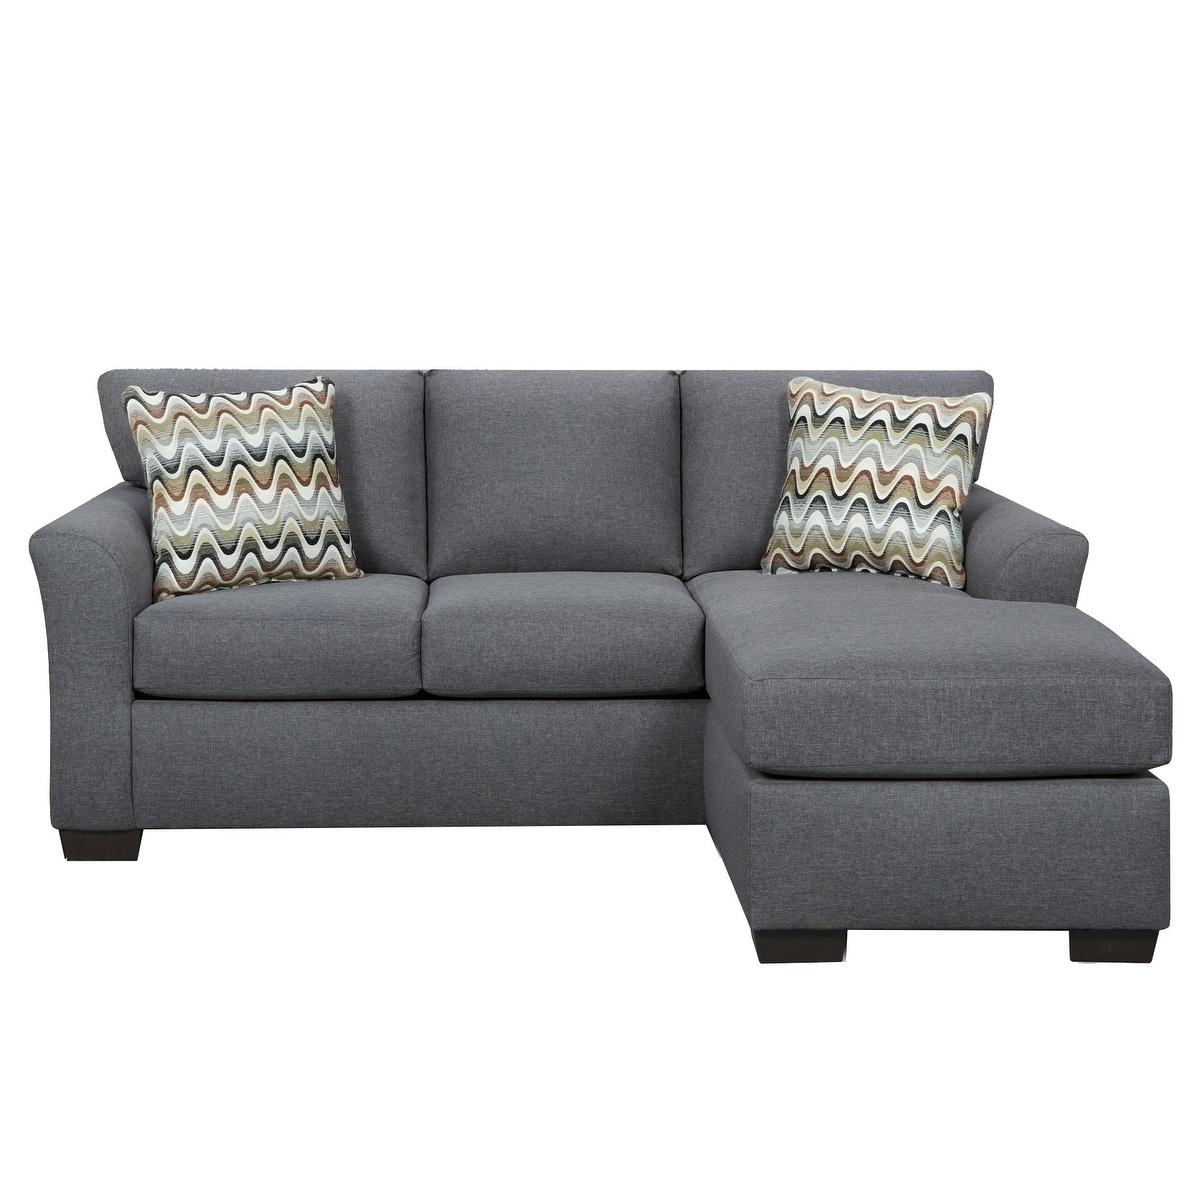 Weaver Queen Sleeper Sofa Chaise